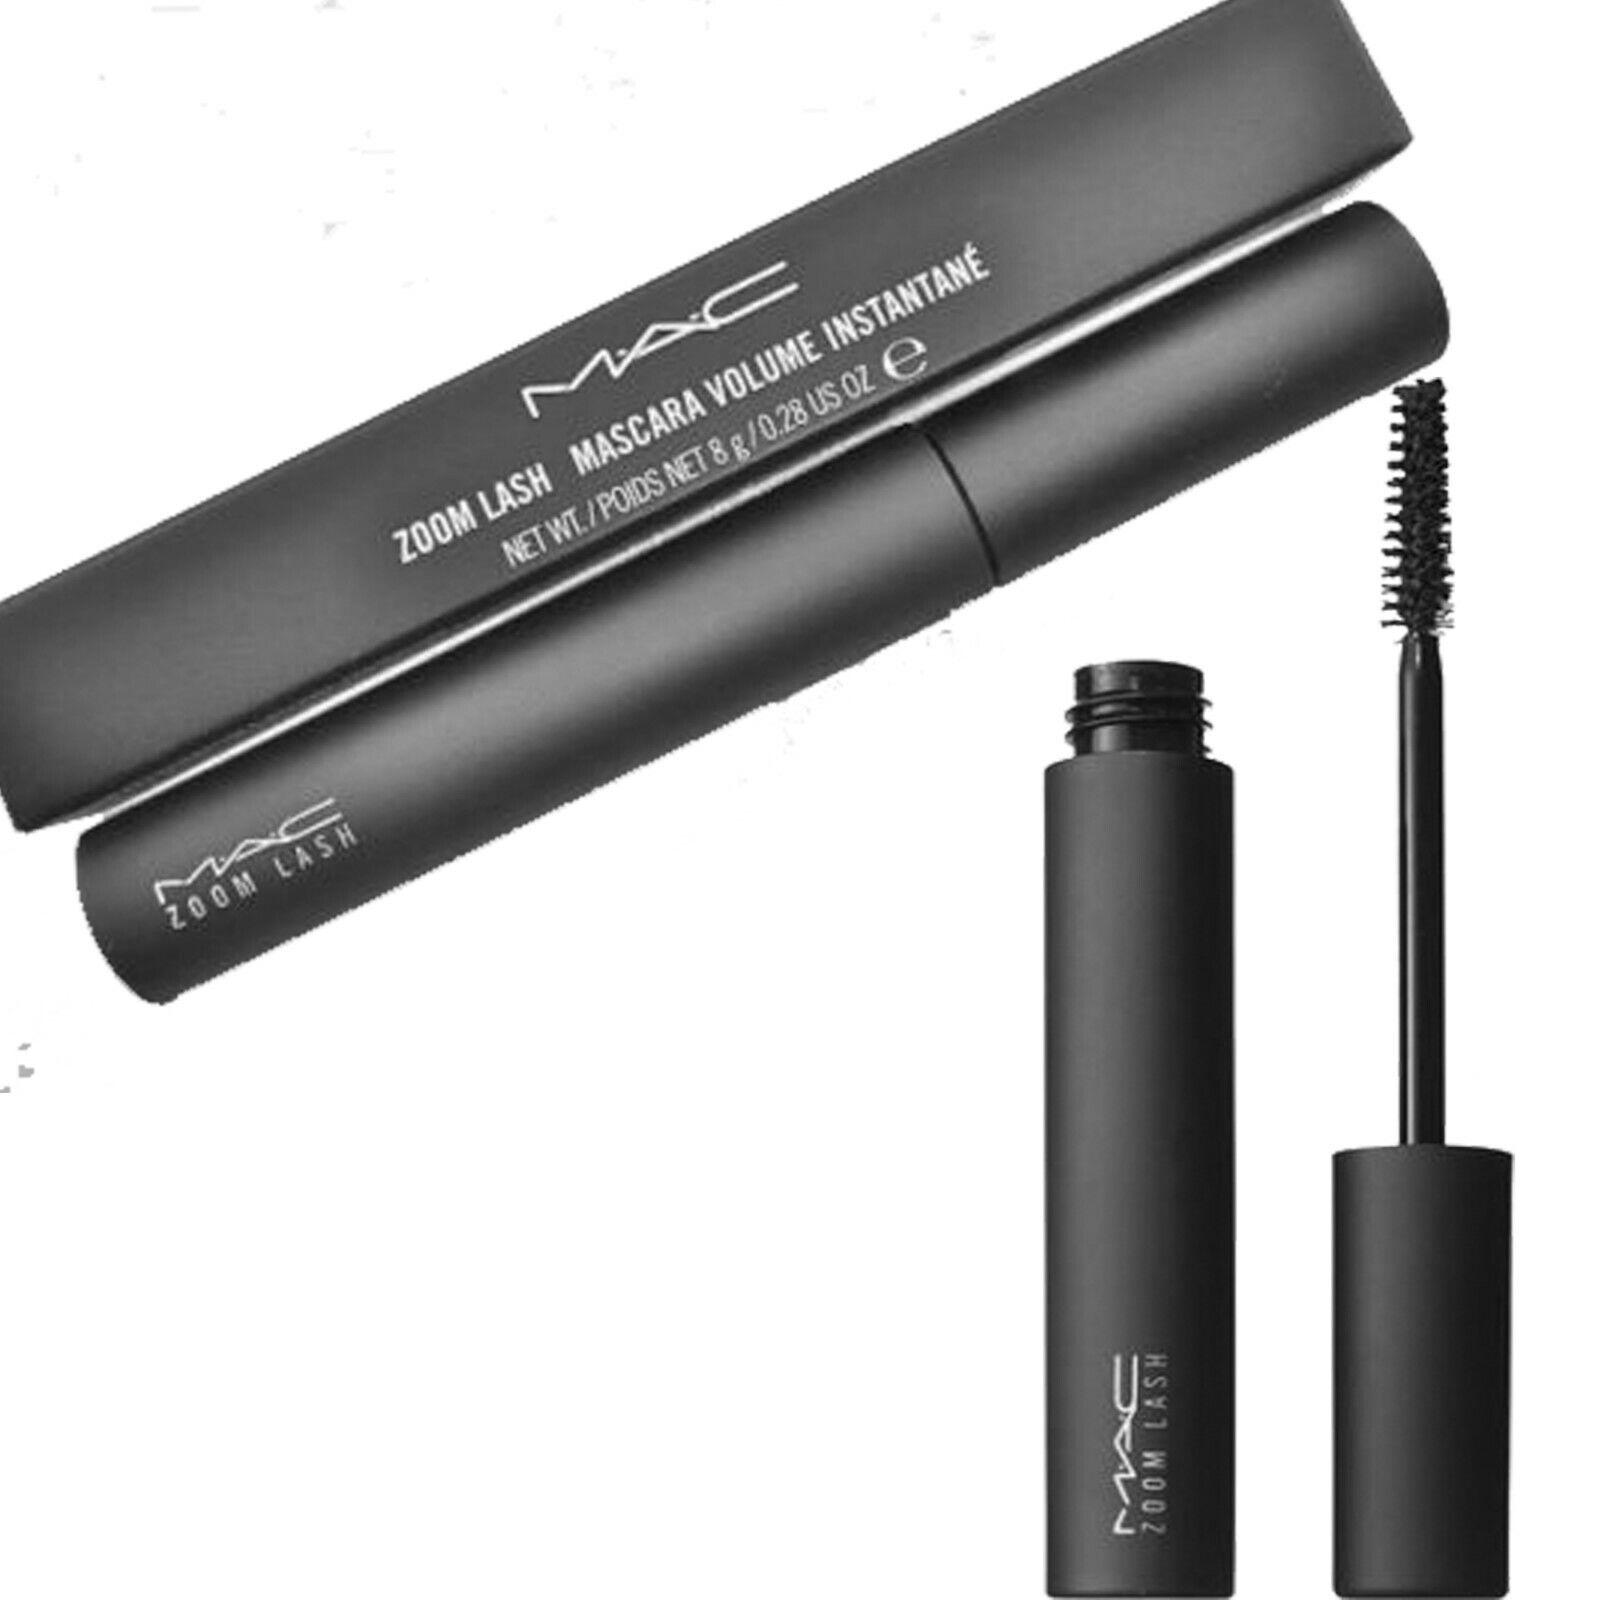 dd59a9247f6 Mac Mascara 8g Zoom Lash Black Mascara Volume Instant Eye Make up ...